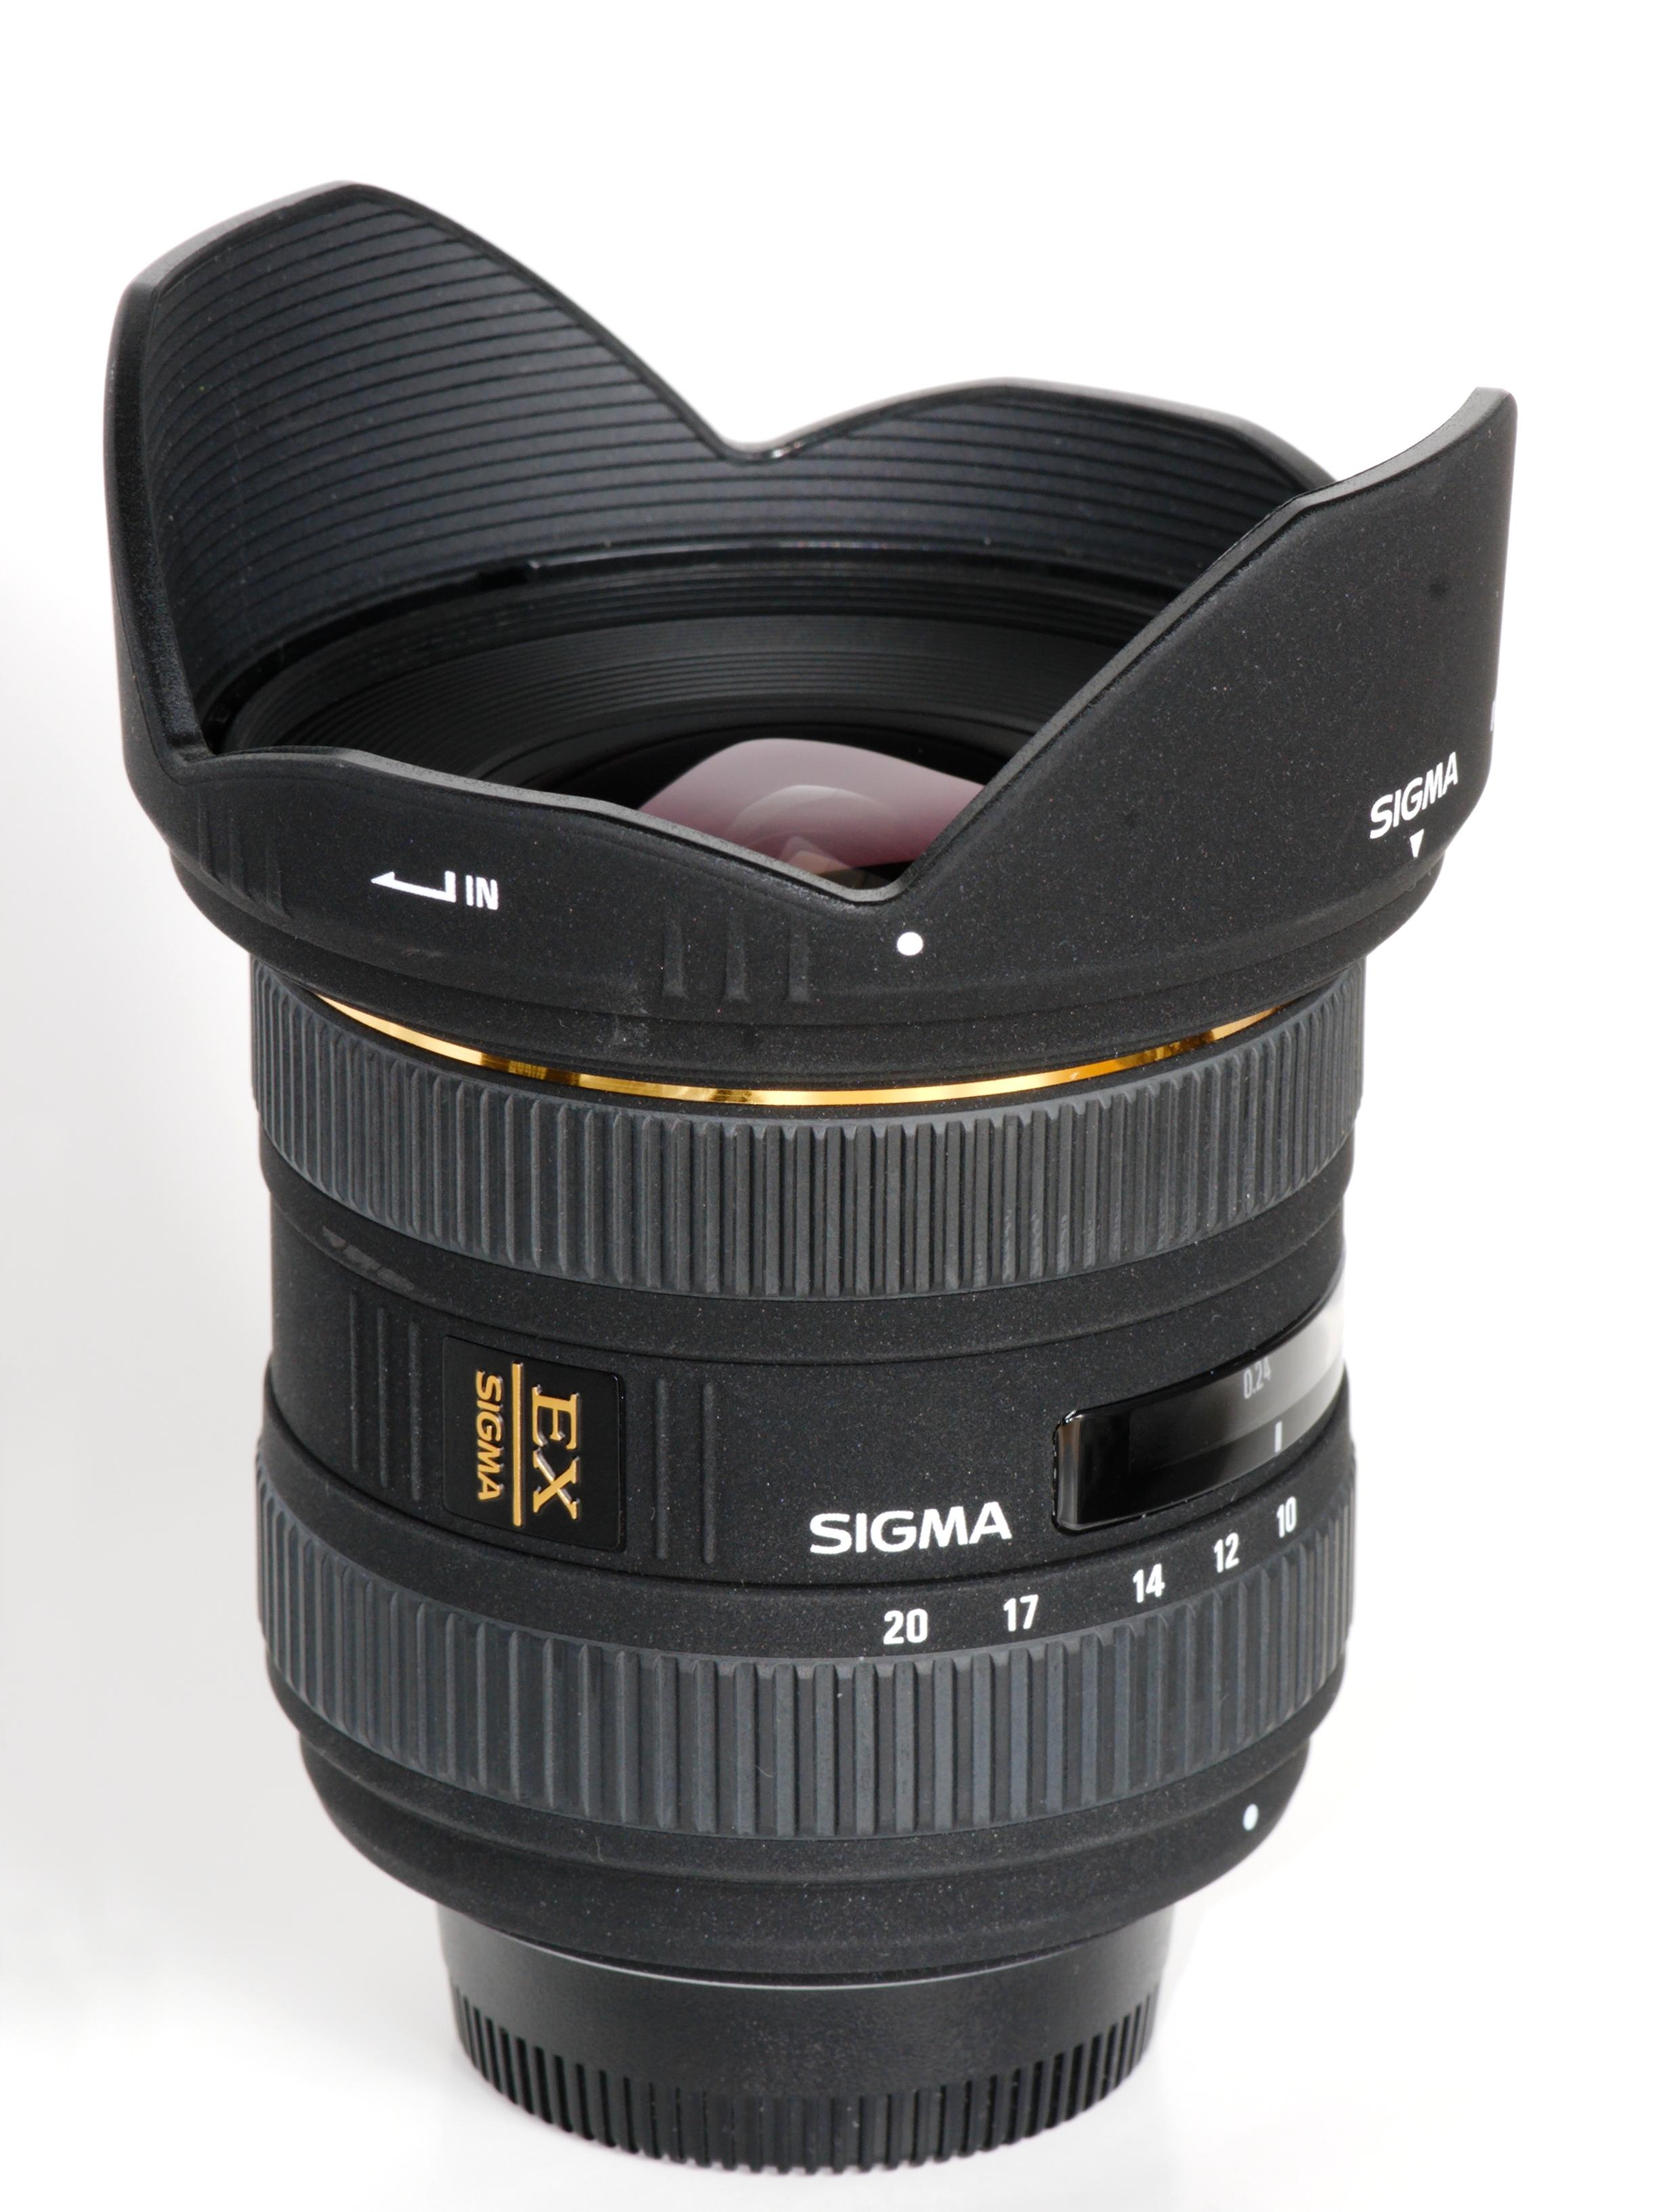 sigma 10-20 mm